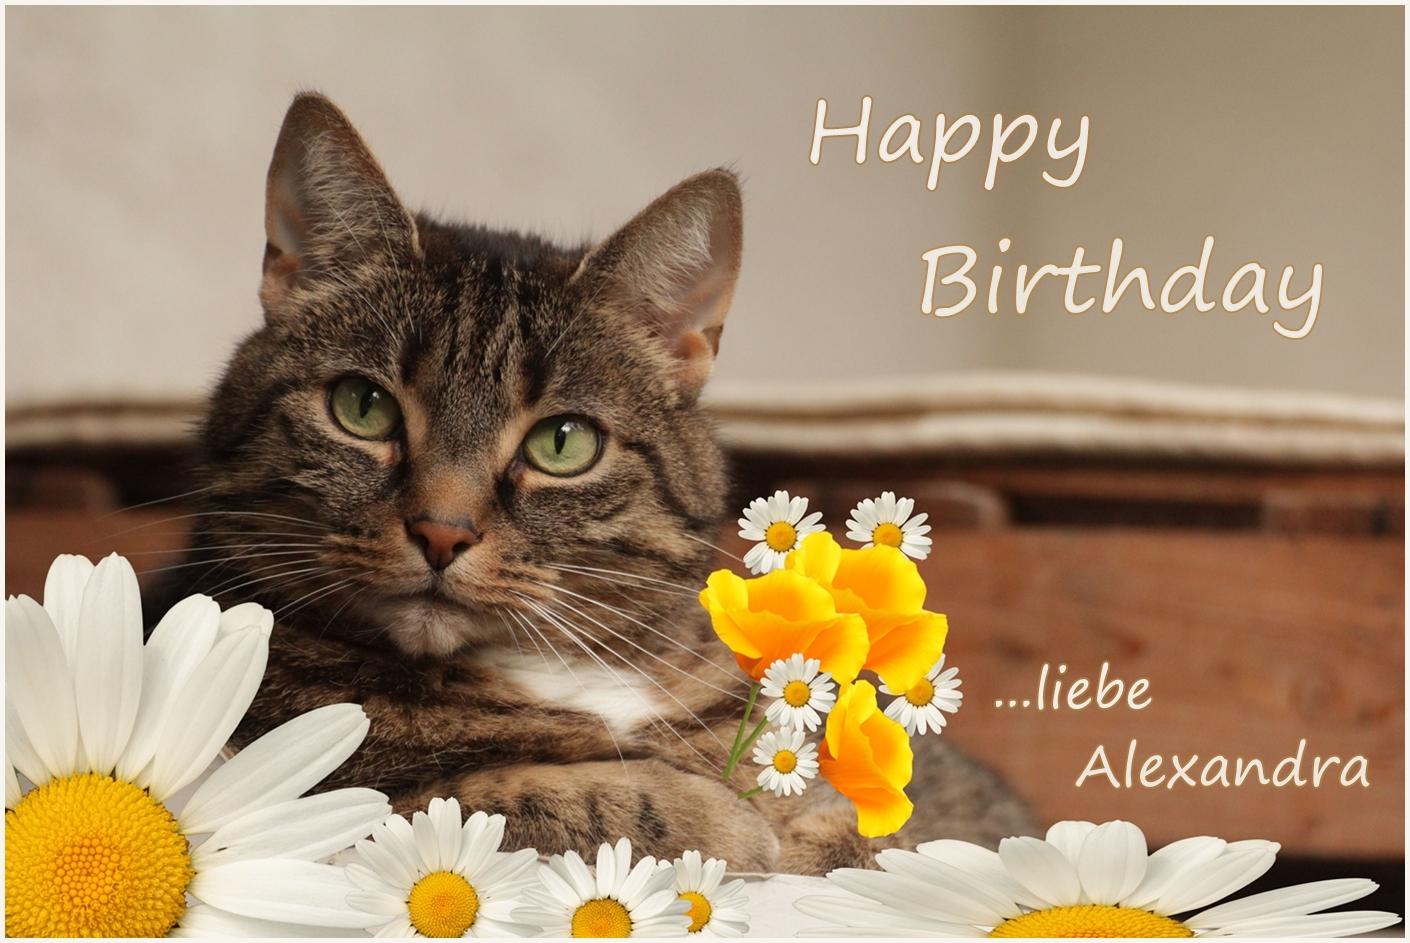 Alexandra hat geburtstag foto bild spezial katzen geburtstag bilder auf fotocommunity - Geburtstagsbilder zum 25 ...